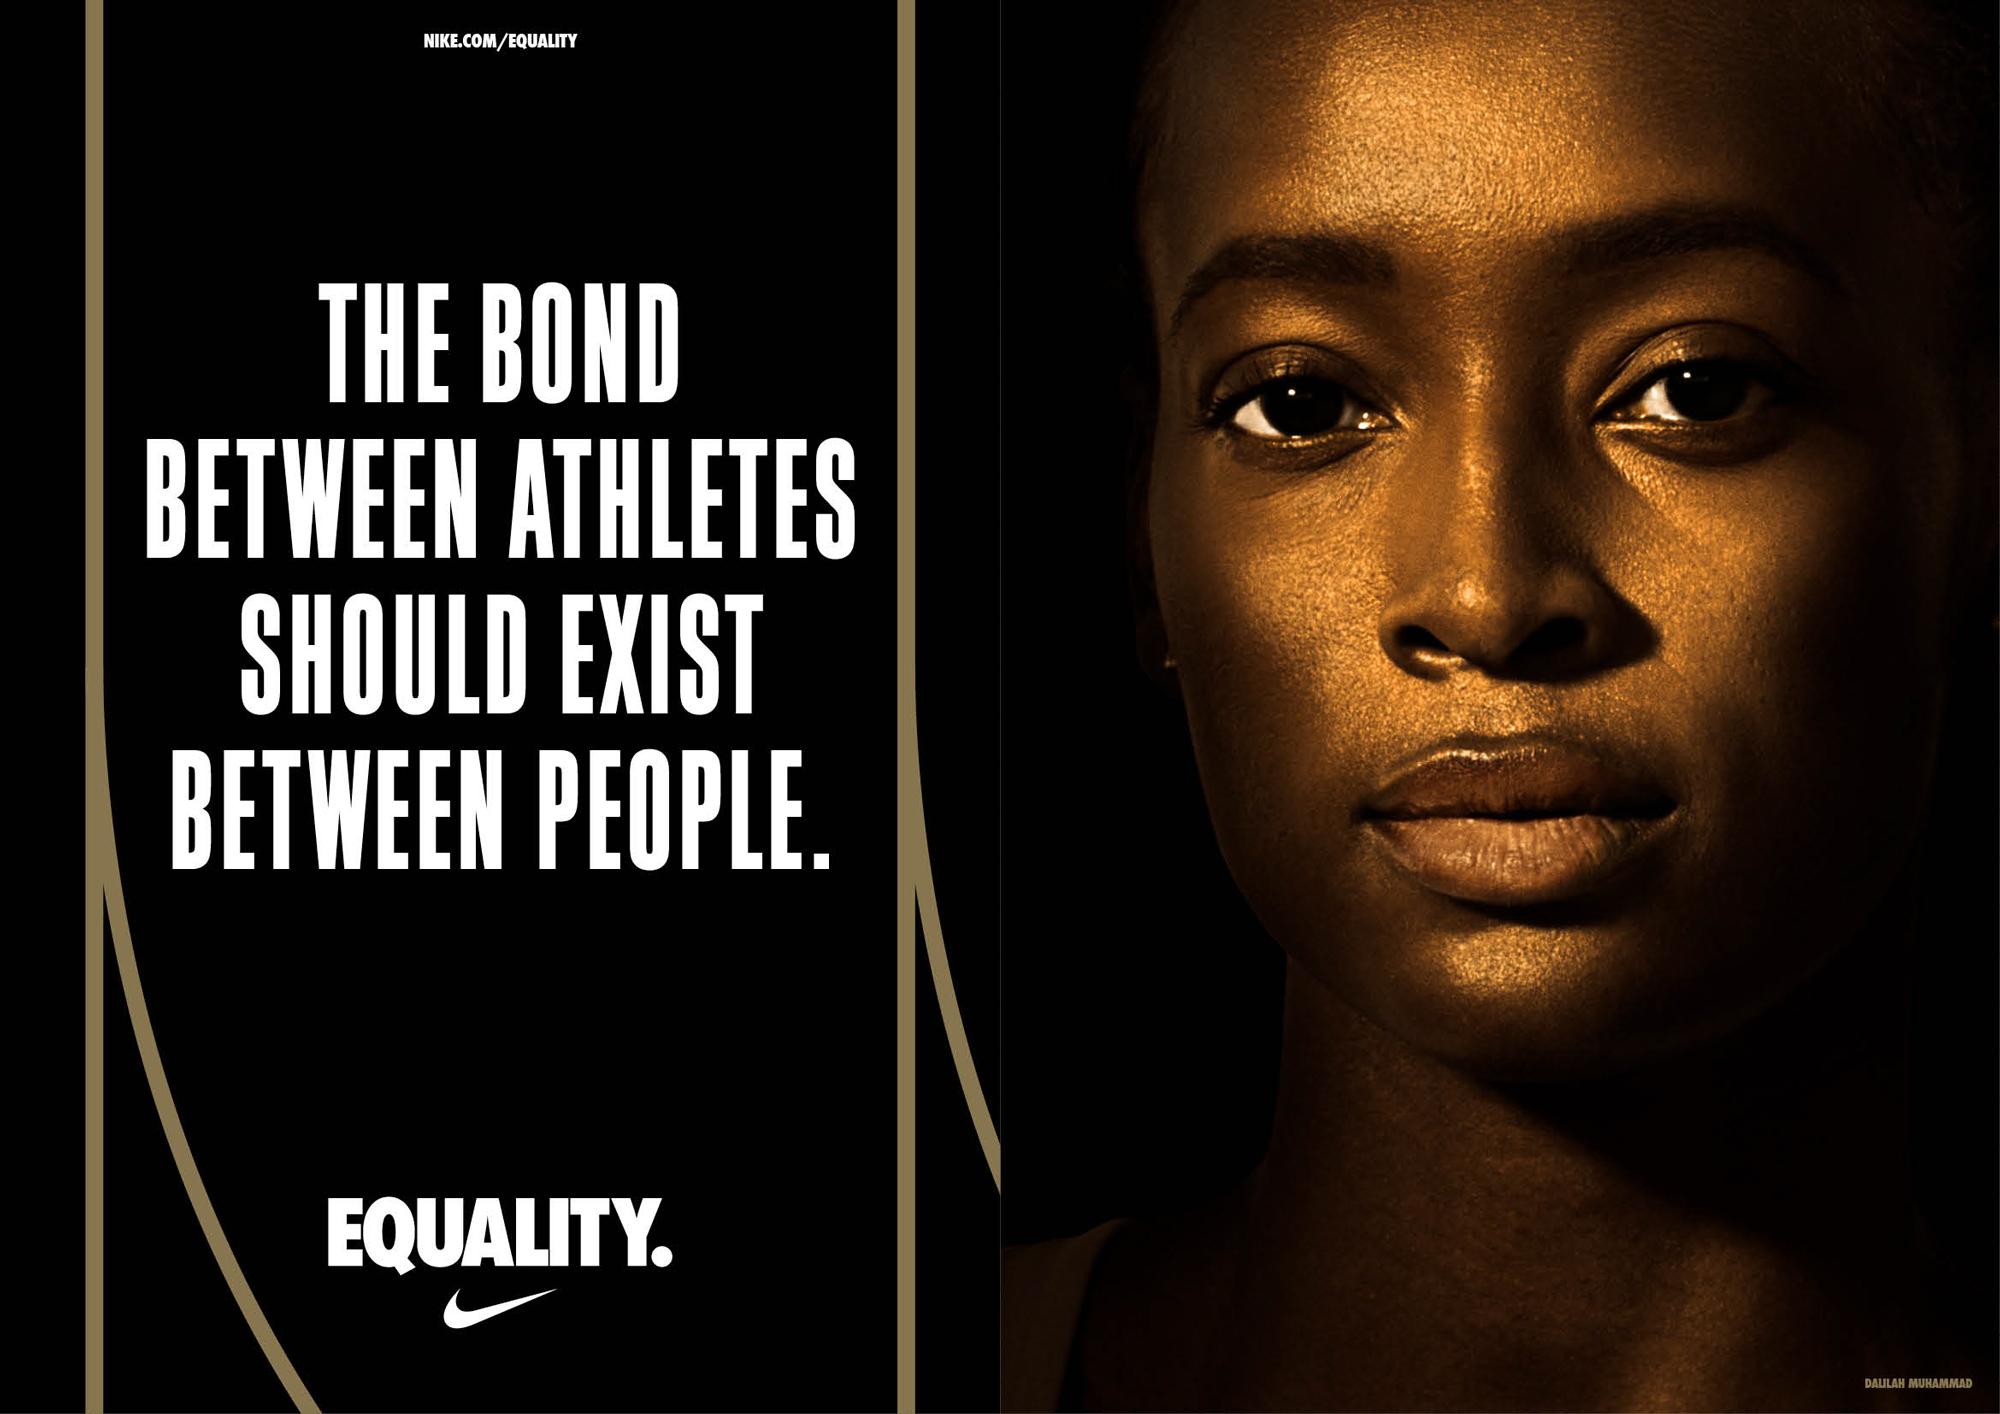 SP17_NABD_Equality_DalilahMuhammad_Spreads.jpg